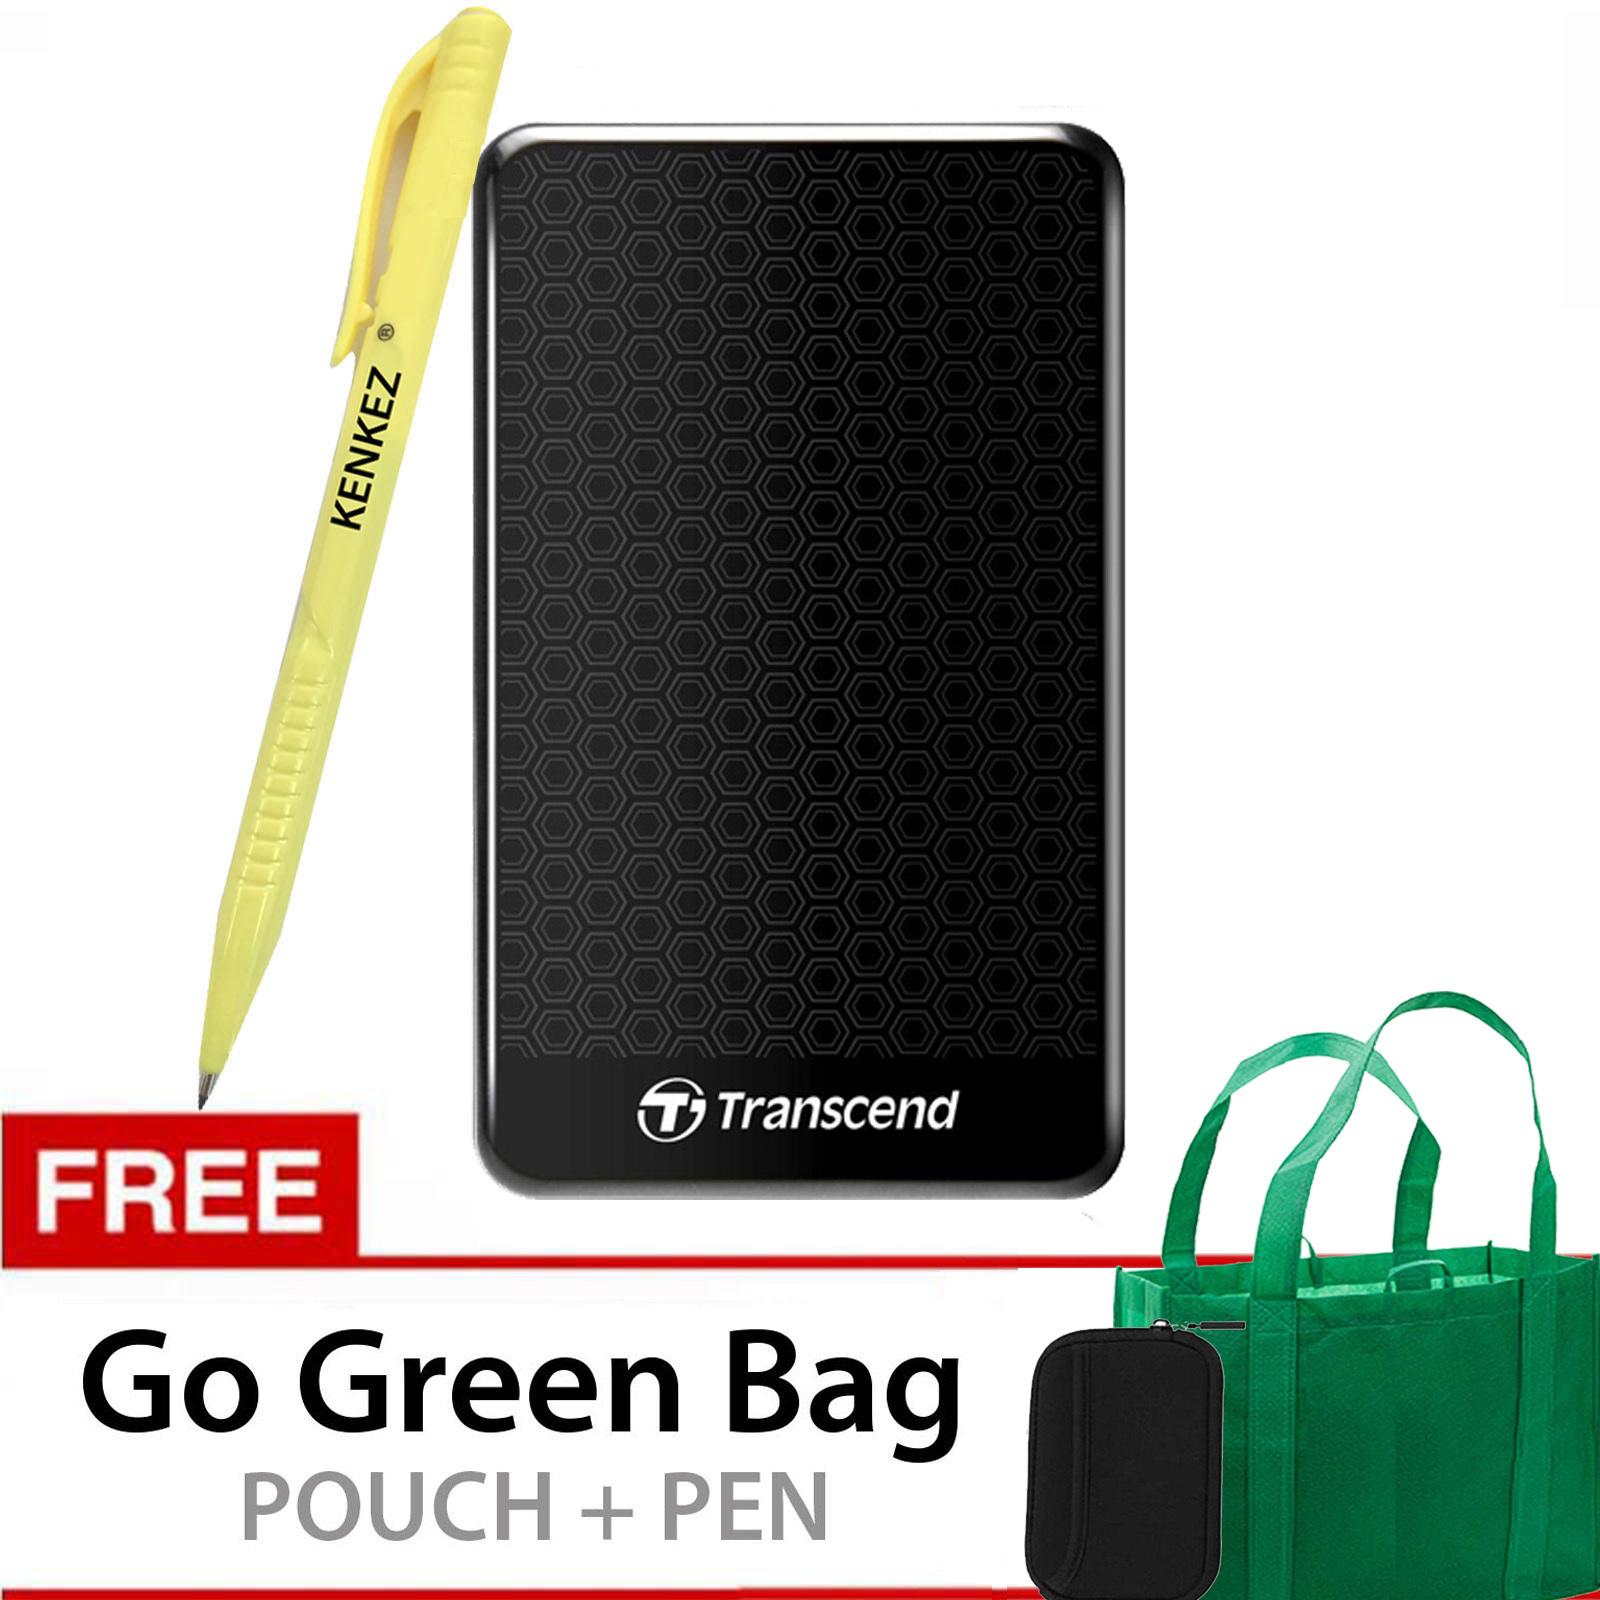 Top 10 Transcend Storejet Usb 3 1Tb Hitam Gratis Go Green Bag Pouch Pen Online